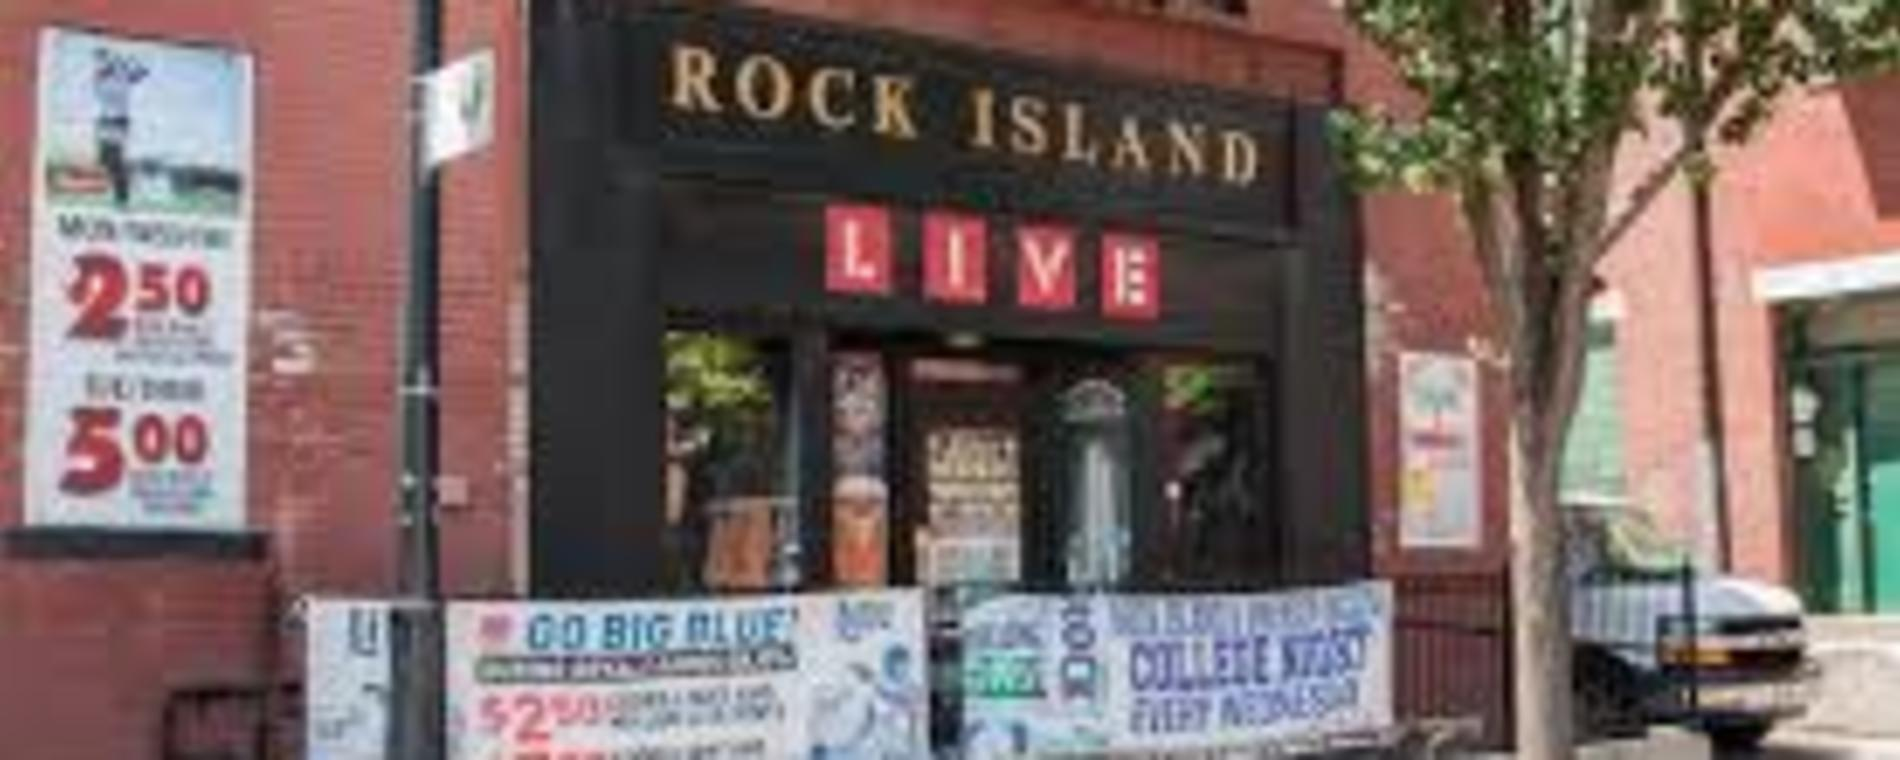 Rock Island LIVE exterior Visit Wichita